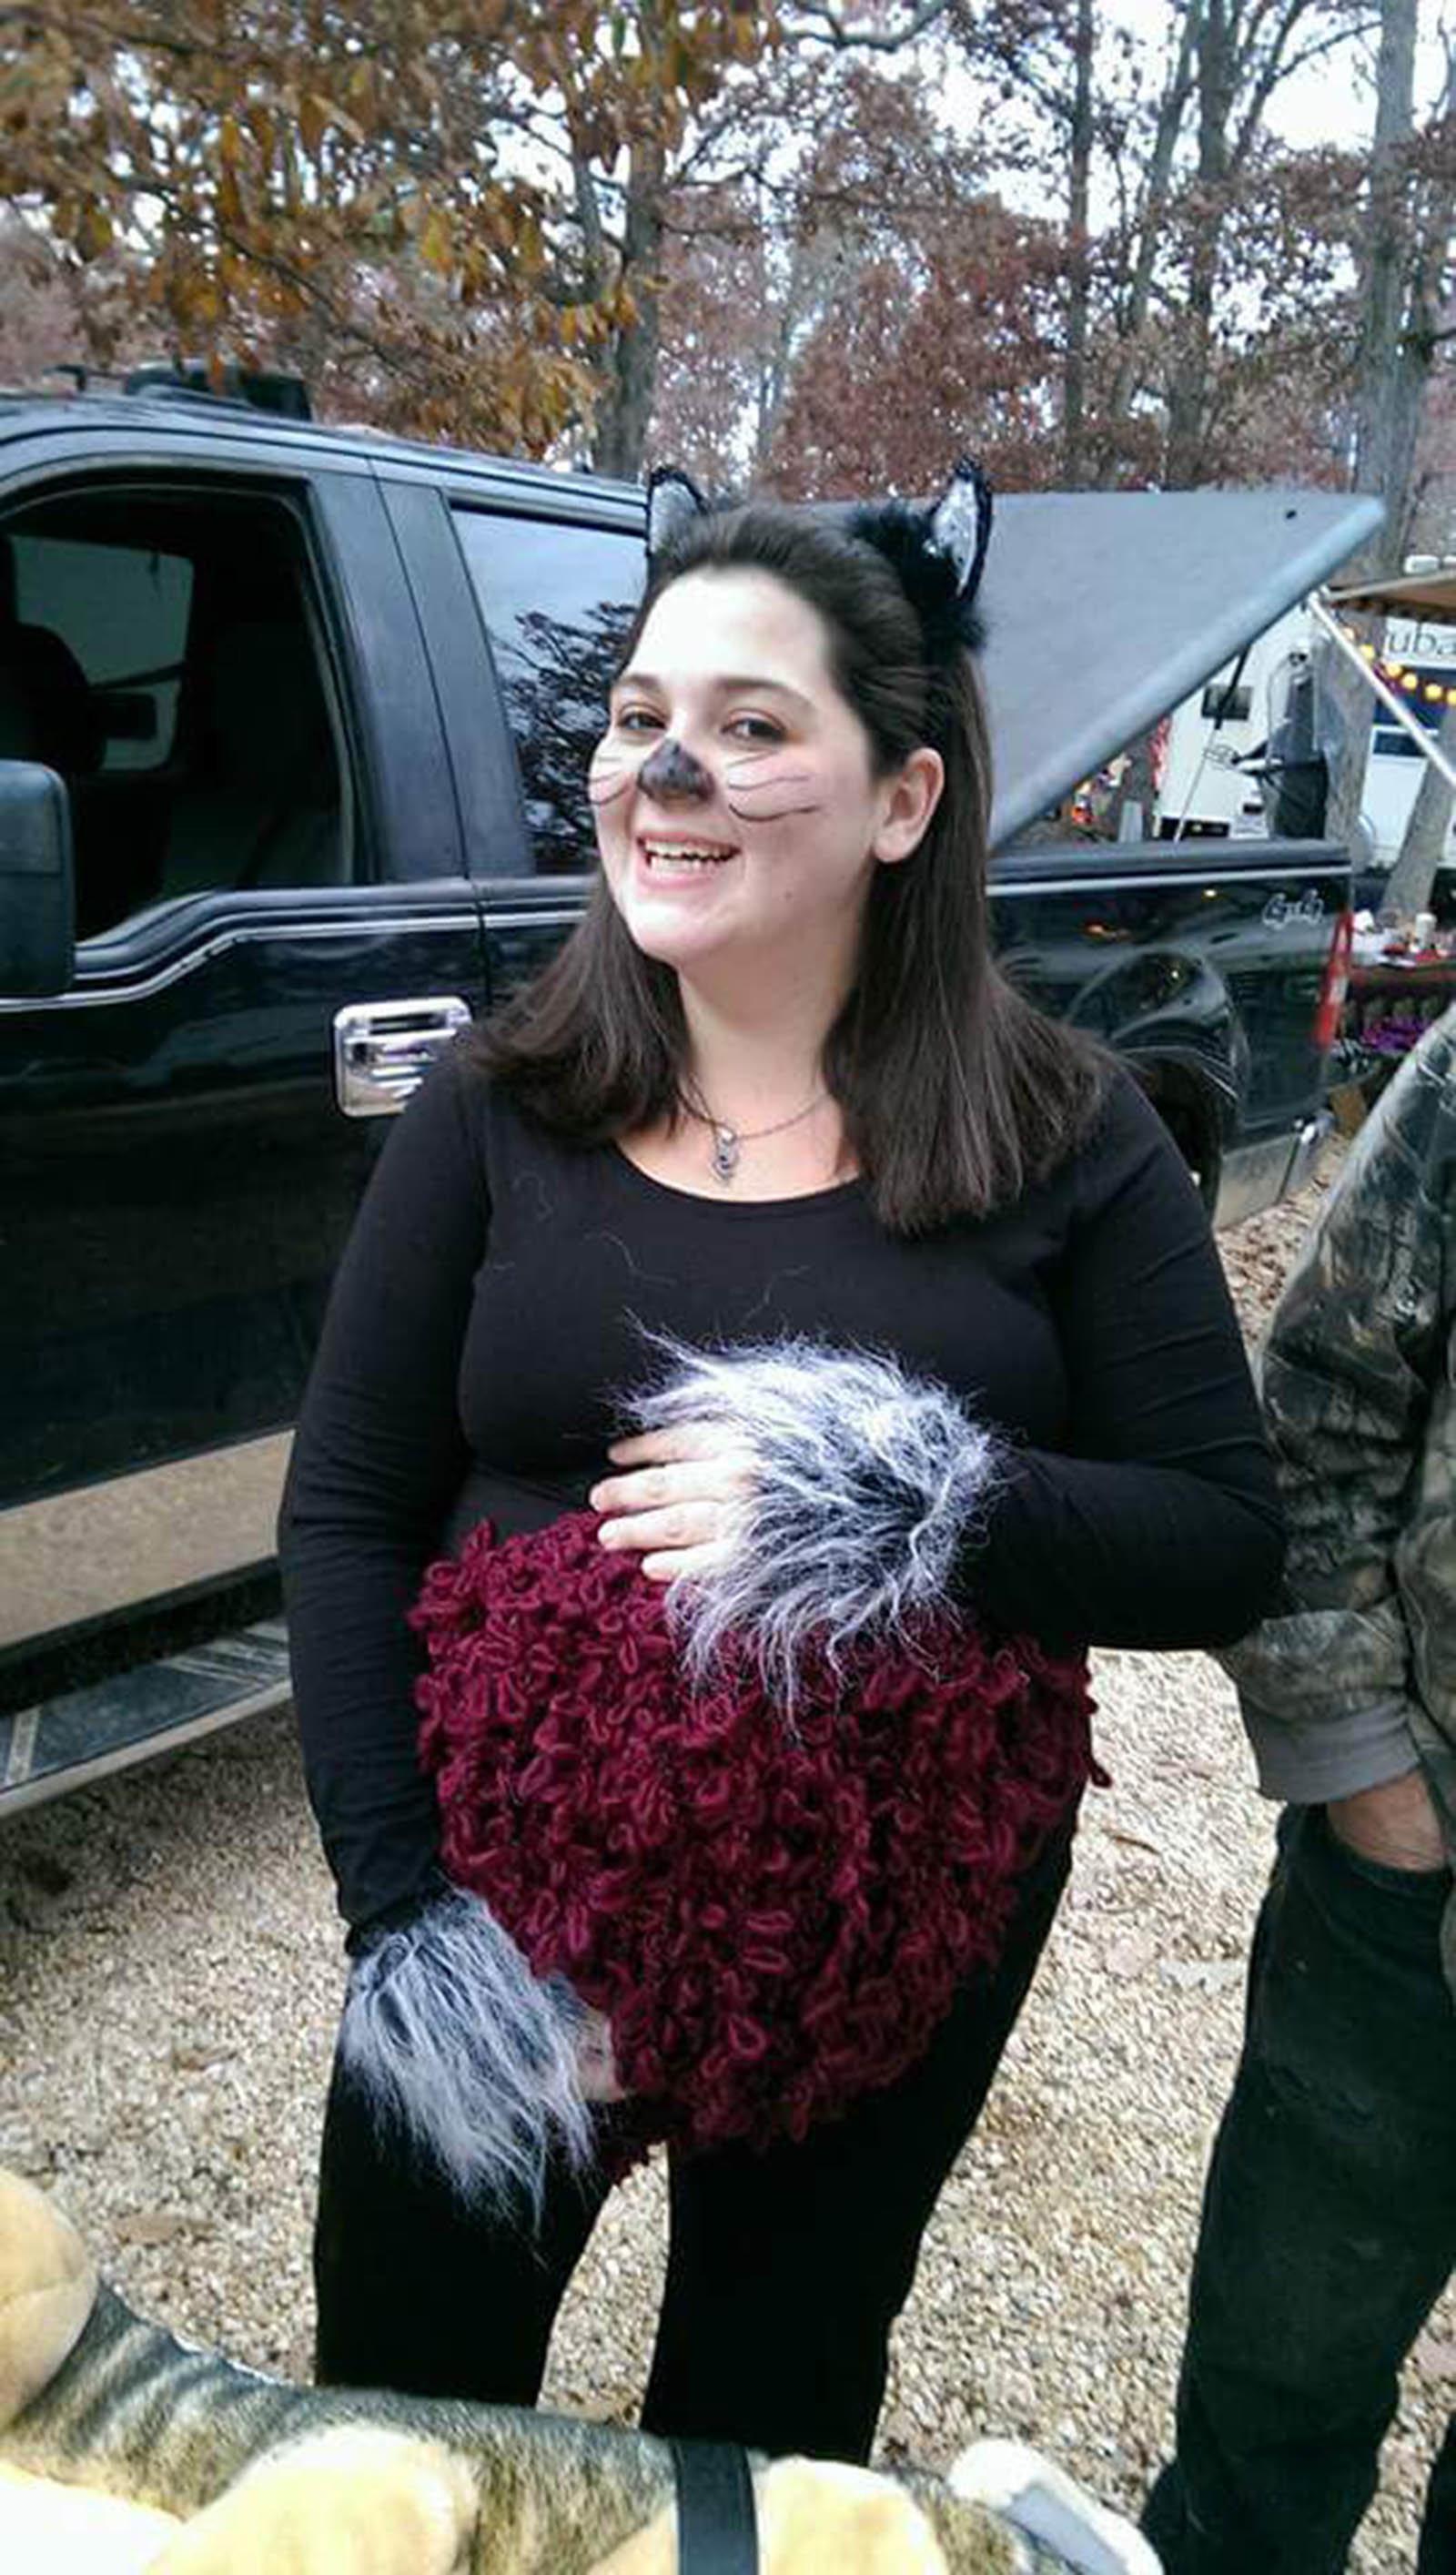 Courtesy ofu0026nbsp;Kristen Robinson  sc 1 st  HuffPost & 41 Creative Halloween Costumes For Pregnant Women   HuffPost